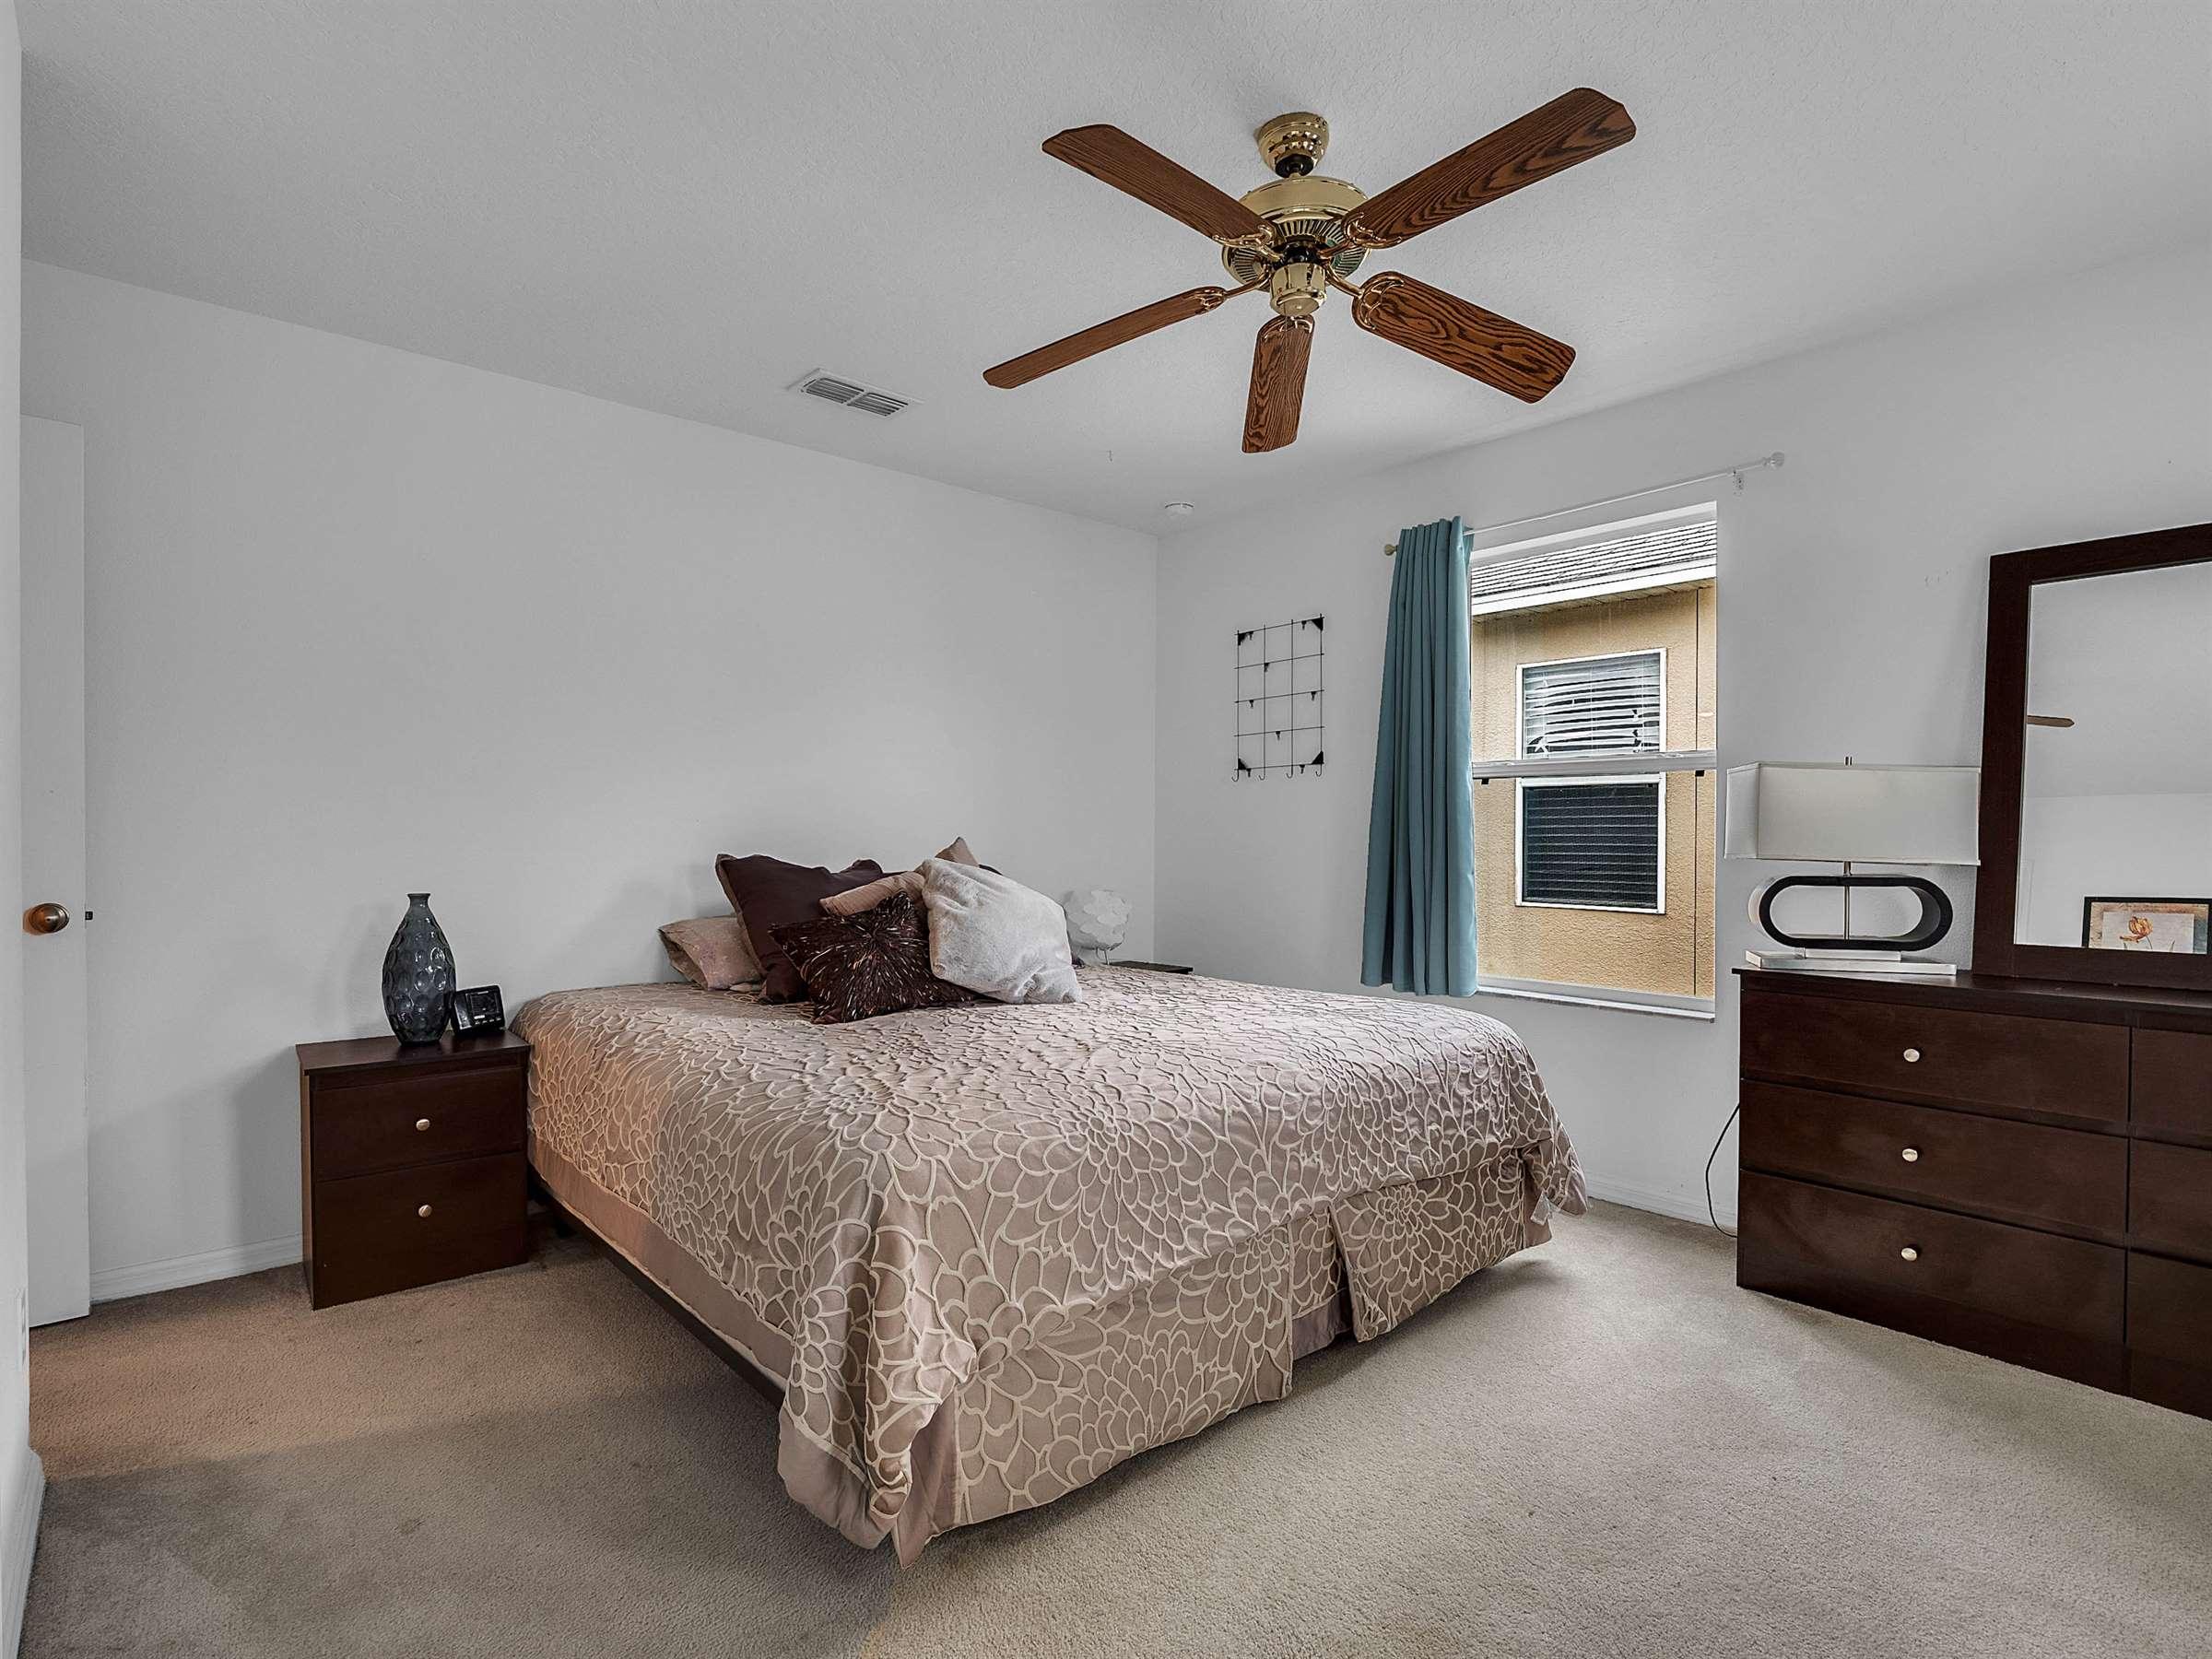 424 Kettering Road, Davenport, FL 33897